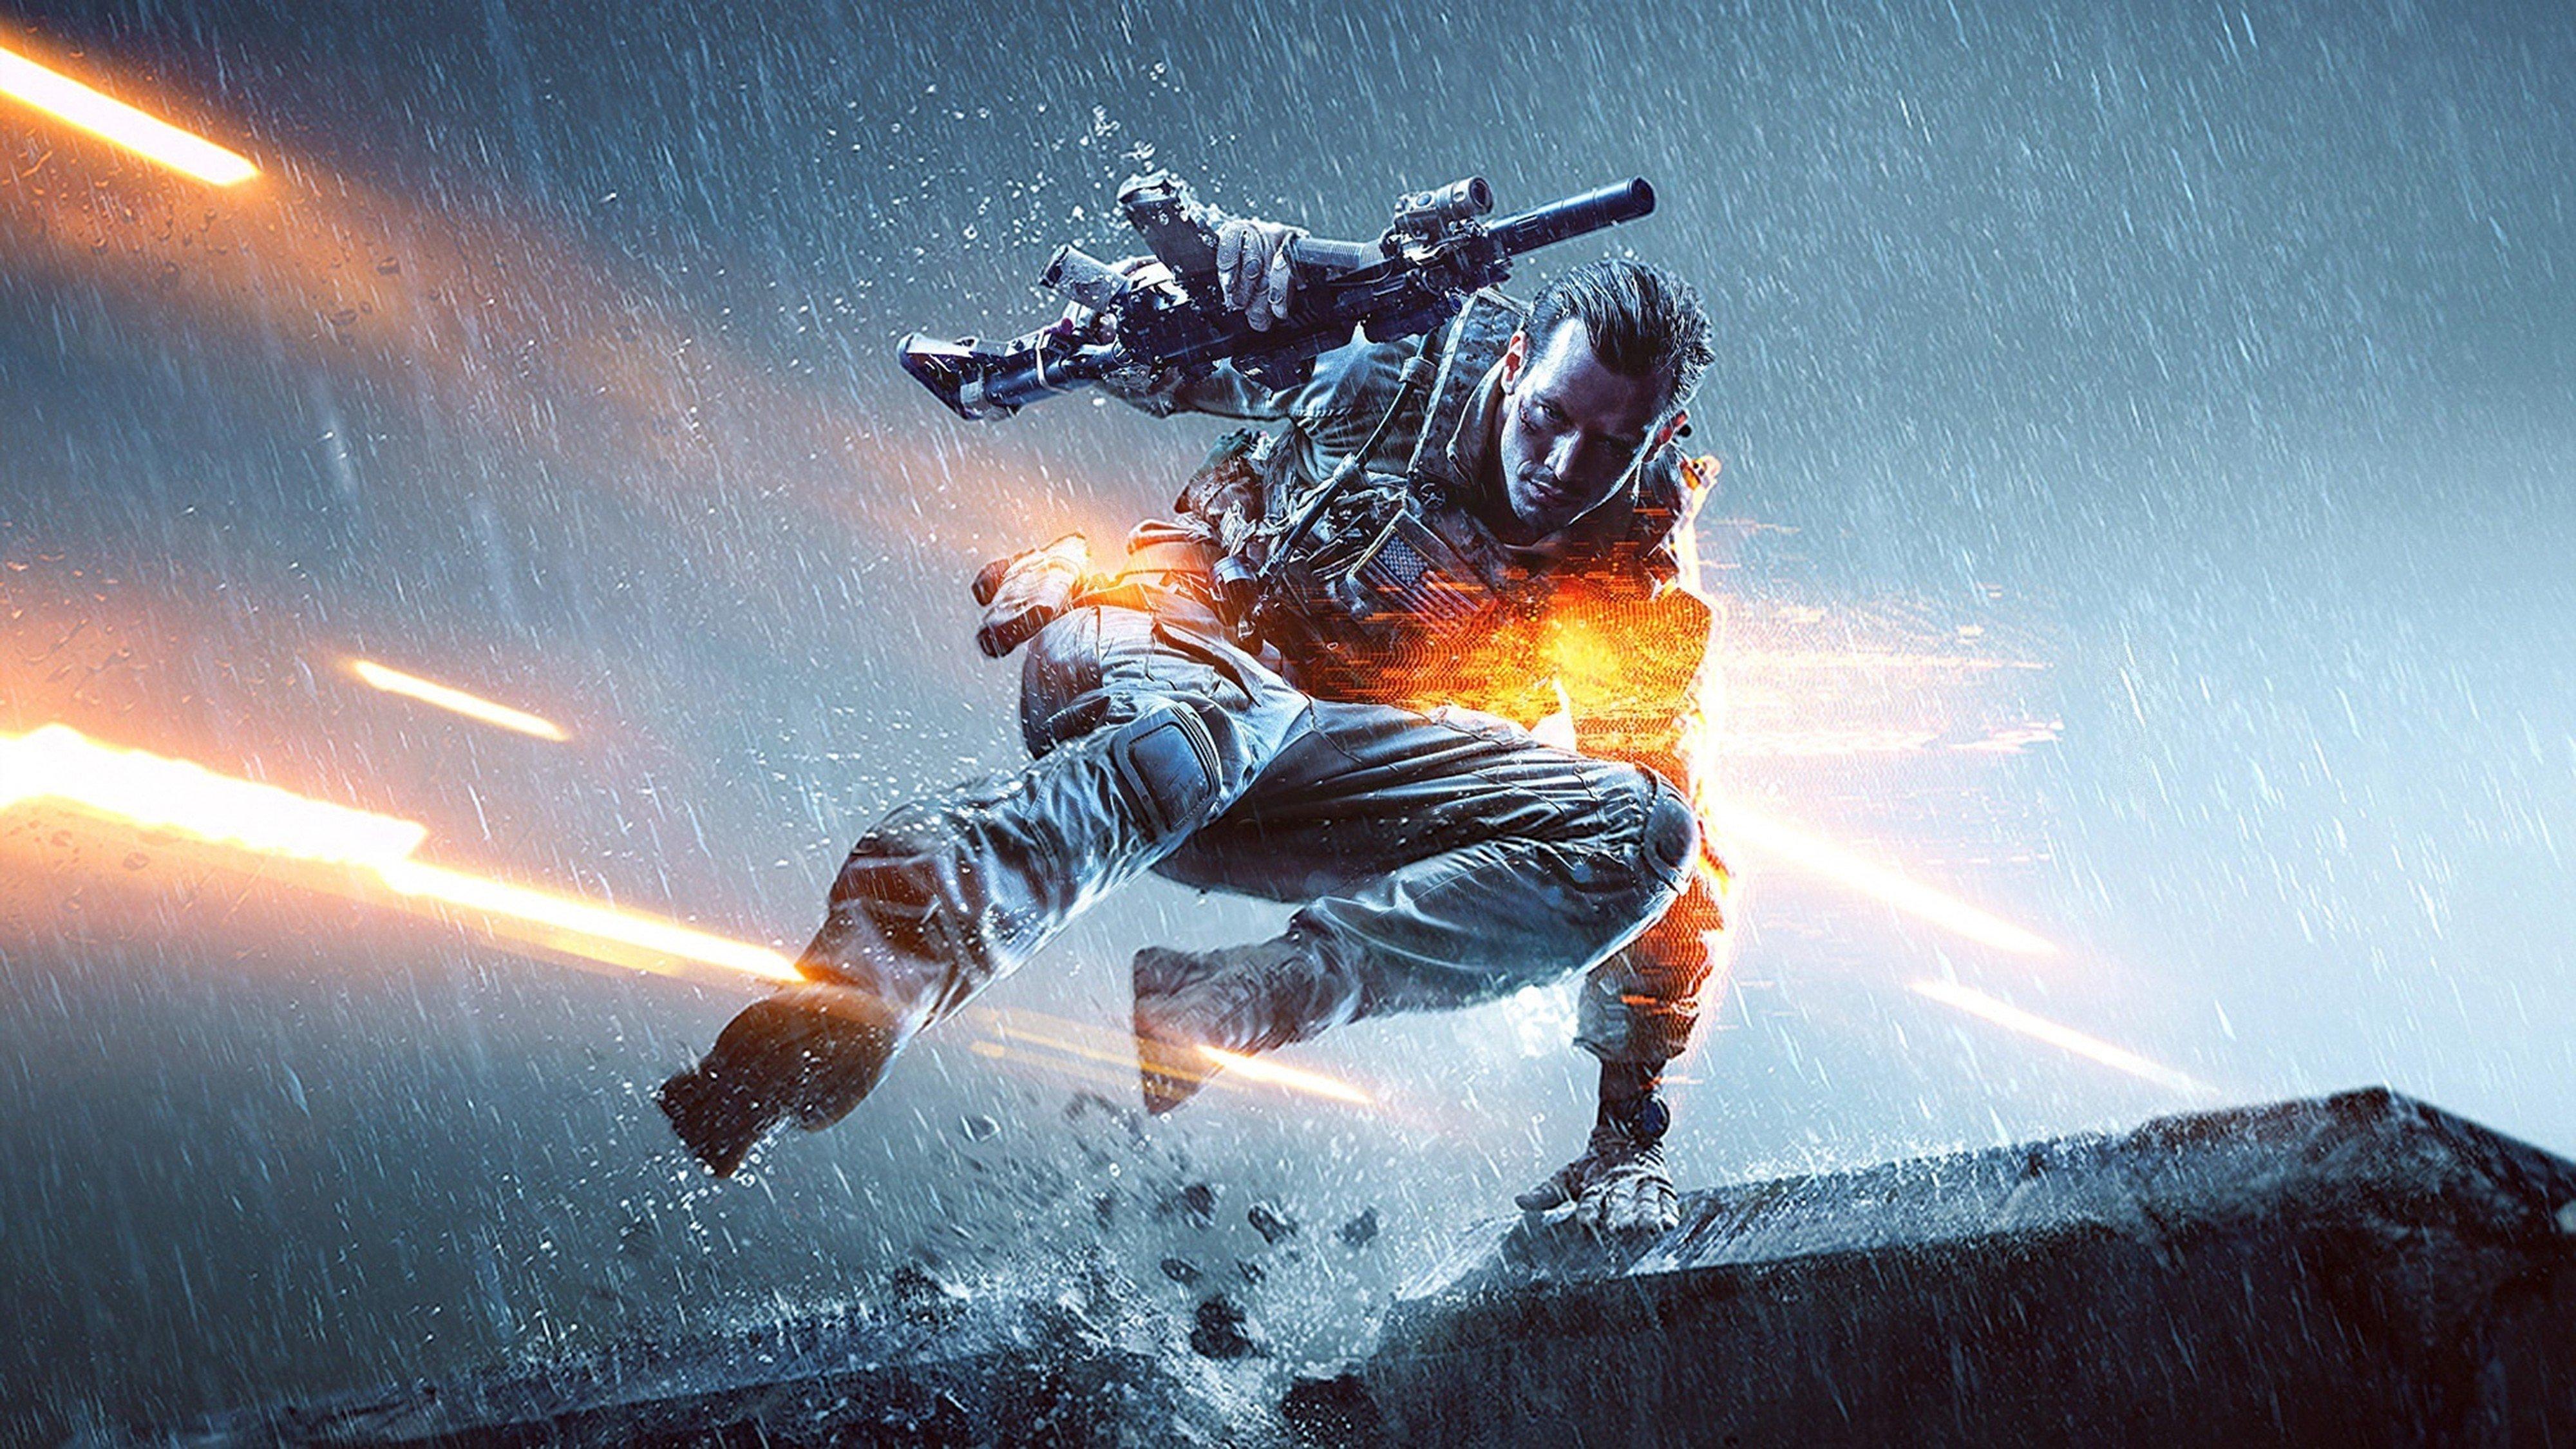 Battlefield 4 Game Soldier Army Wallpaper  4000x2250